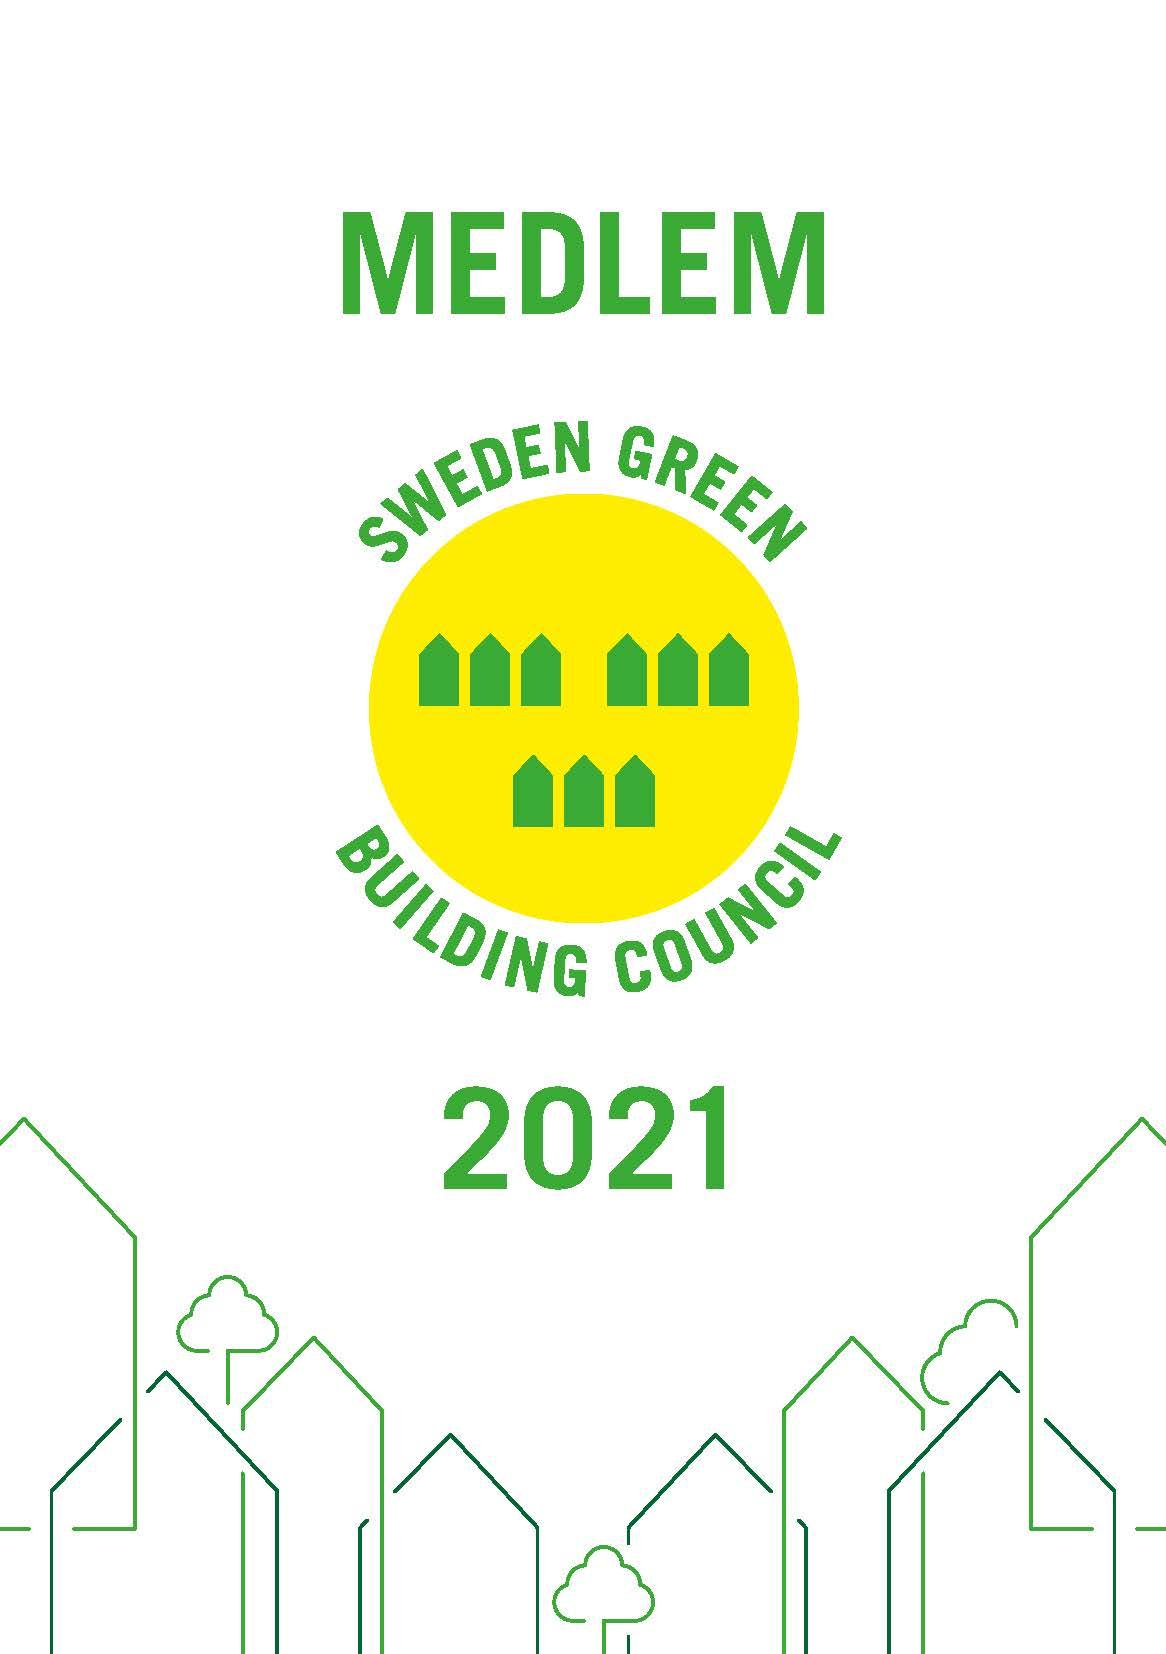 Medlemsbevis Sweden Green Building Council 2021